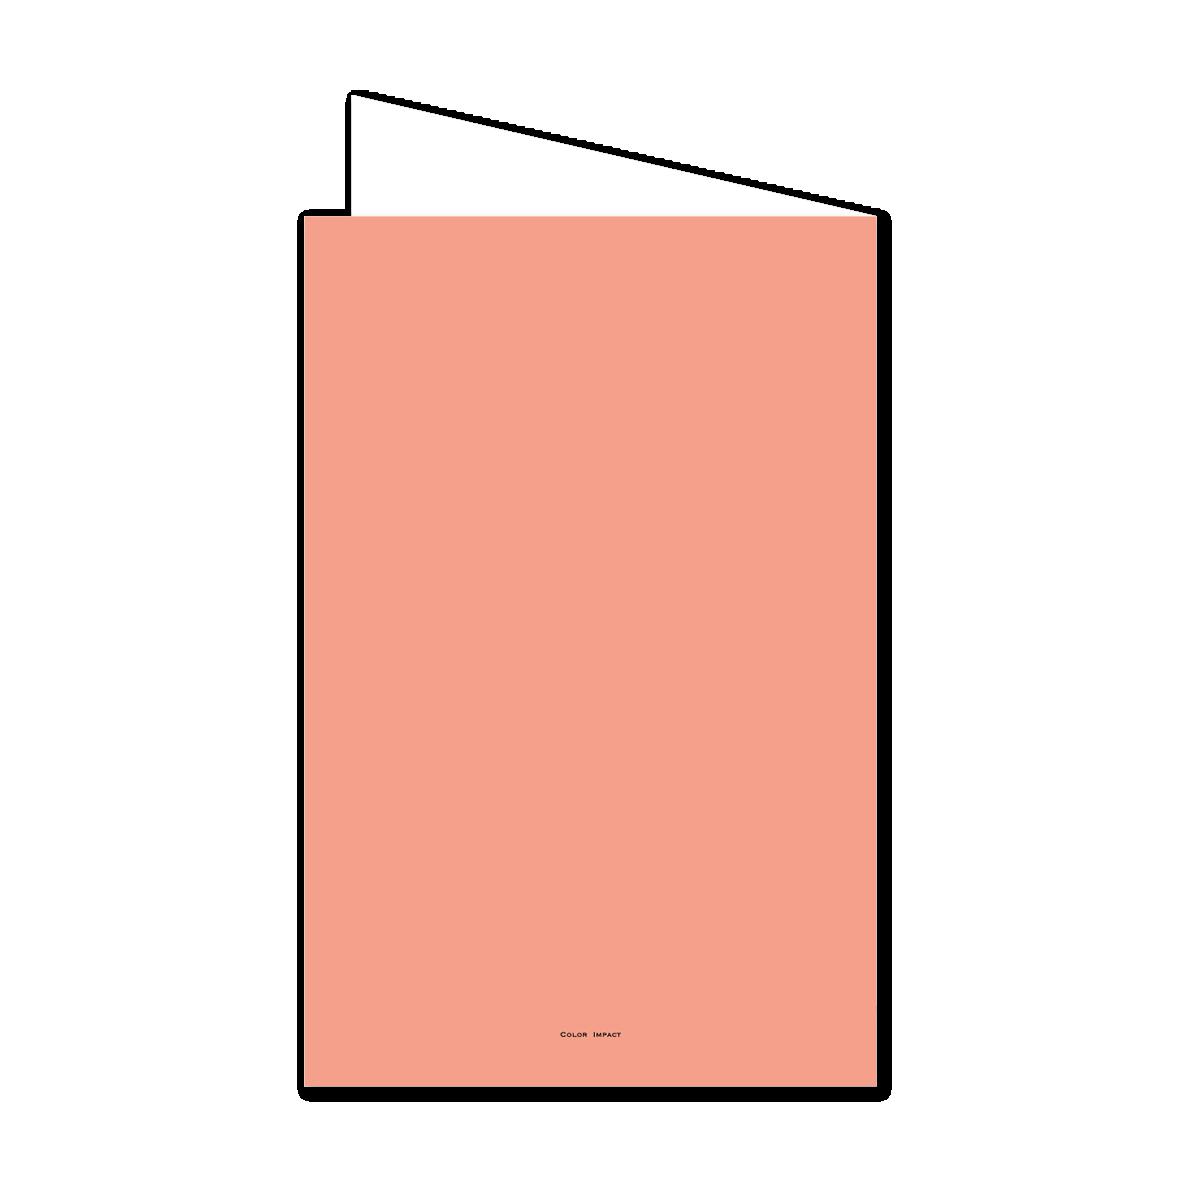 model-image